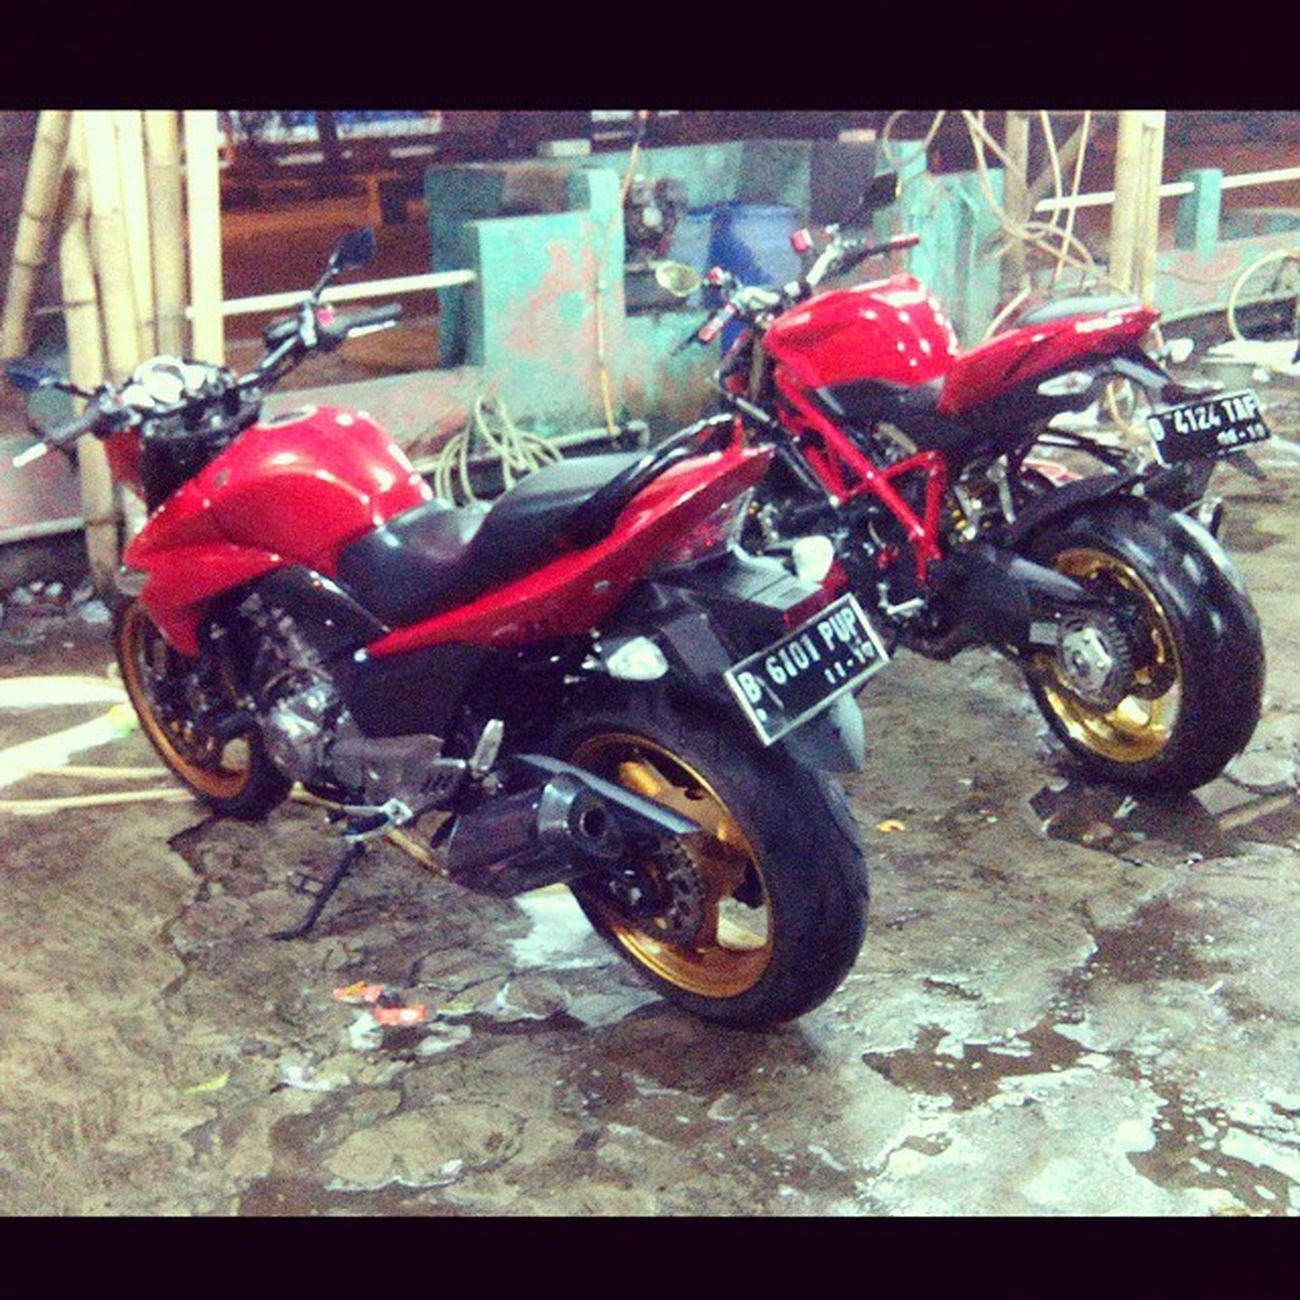 Just take a bath... Ducati Ducatistreetfighter 848Evo Suzuki inazuma SuzukiInazuma gw250 red redbike streetbike streetfighter marchesini marchesiniwheel photoofheday instaphoto instadaily